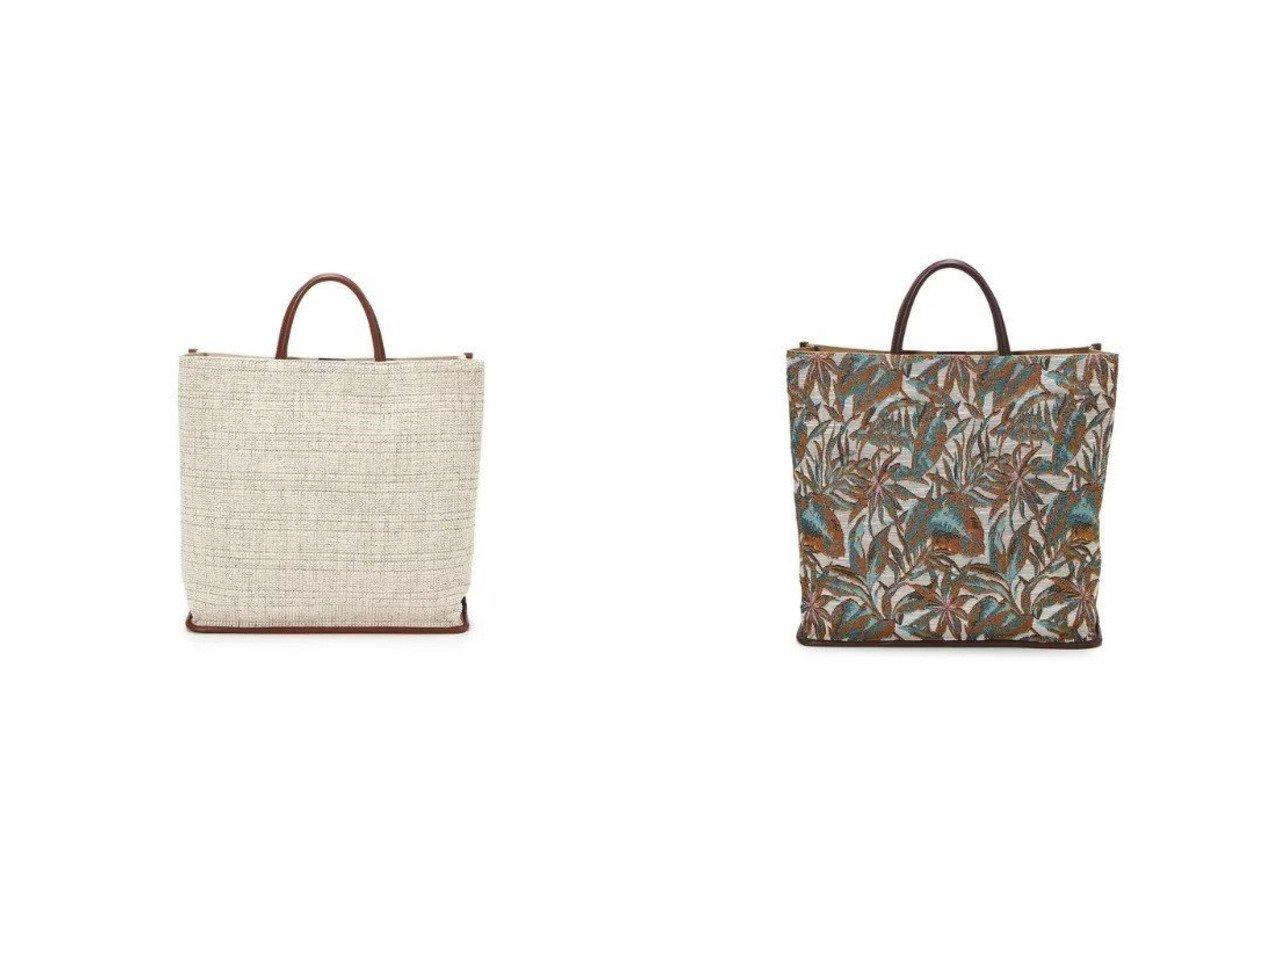 【TOPKAPI/トプカピ】のモールファブリック パイピング トートバッグ&リーフジャガード パイピング トートバッグ バッグ・鞄のおすすめ!人気、トレンド・レディースファッションの通販 おすすめで人気の流行・トレンド、ファッションの通販商品 メンズファッション・キッズファッション・インテリア・家具・レディースファッション・服の通販 founy(ファニー) https://founy.com/ ファッション Fashion レディースファッション WOMEN バッグ Bag ショルダー シンプル チャーム パイピング フォルム フランス ボタニカル リゾート  ID:crp329100000014480